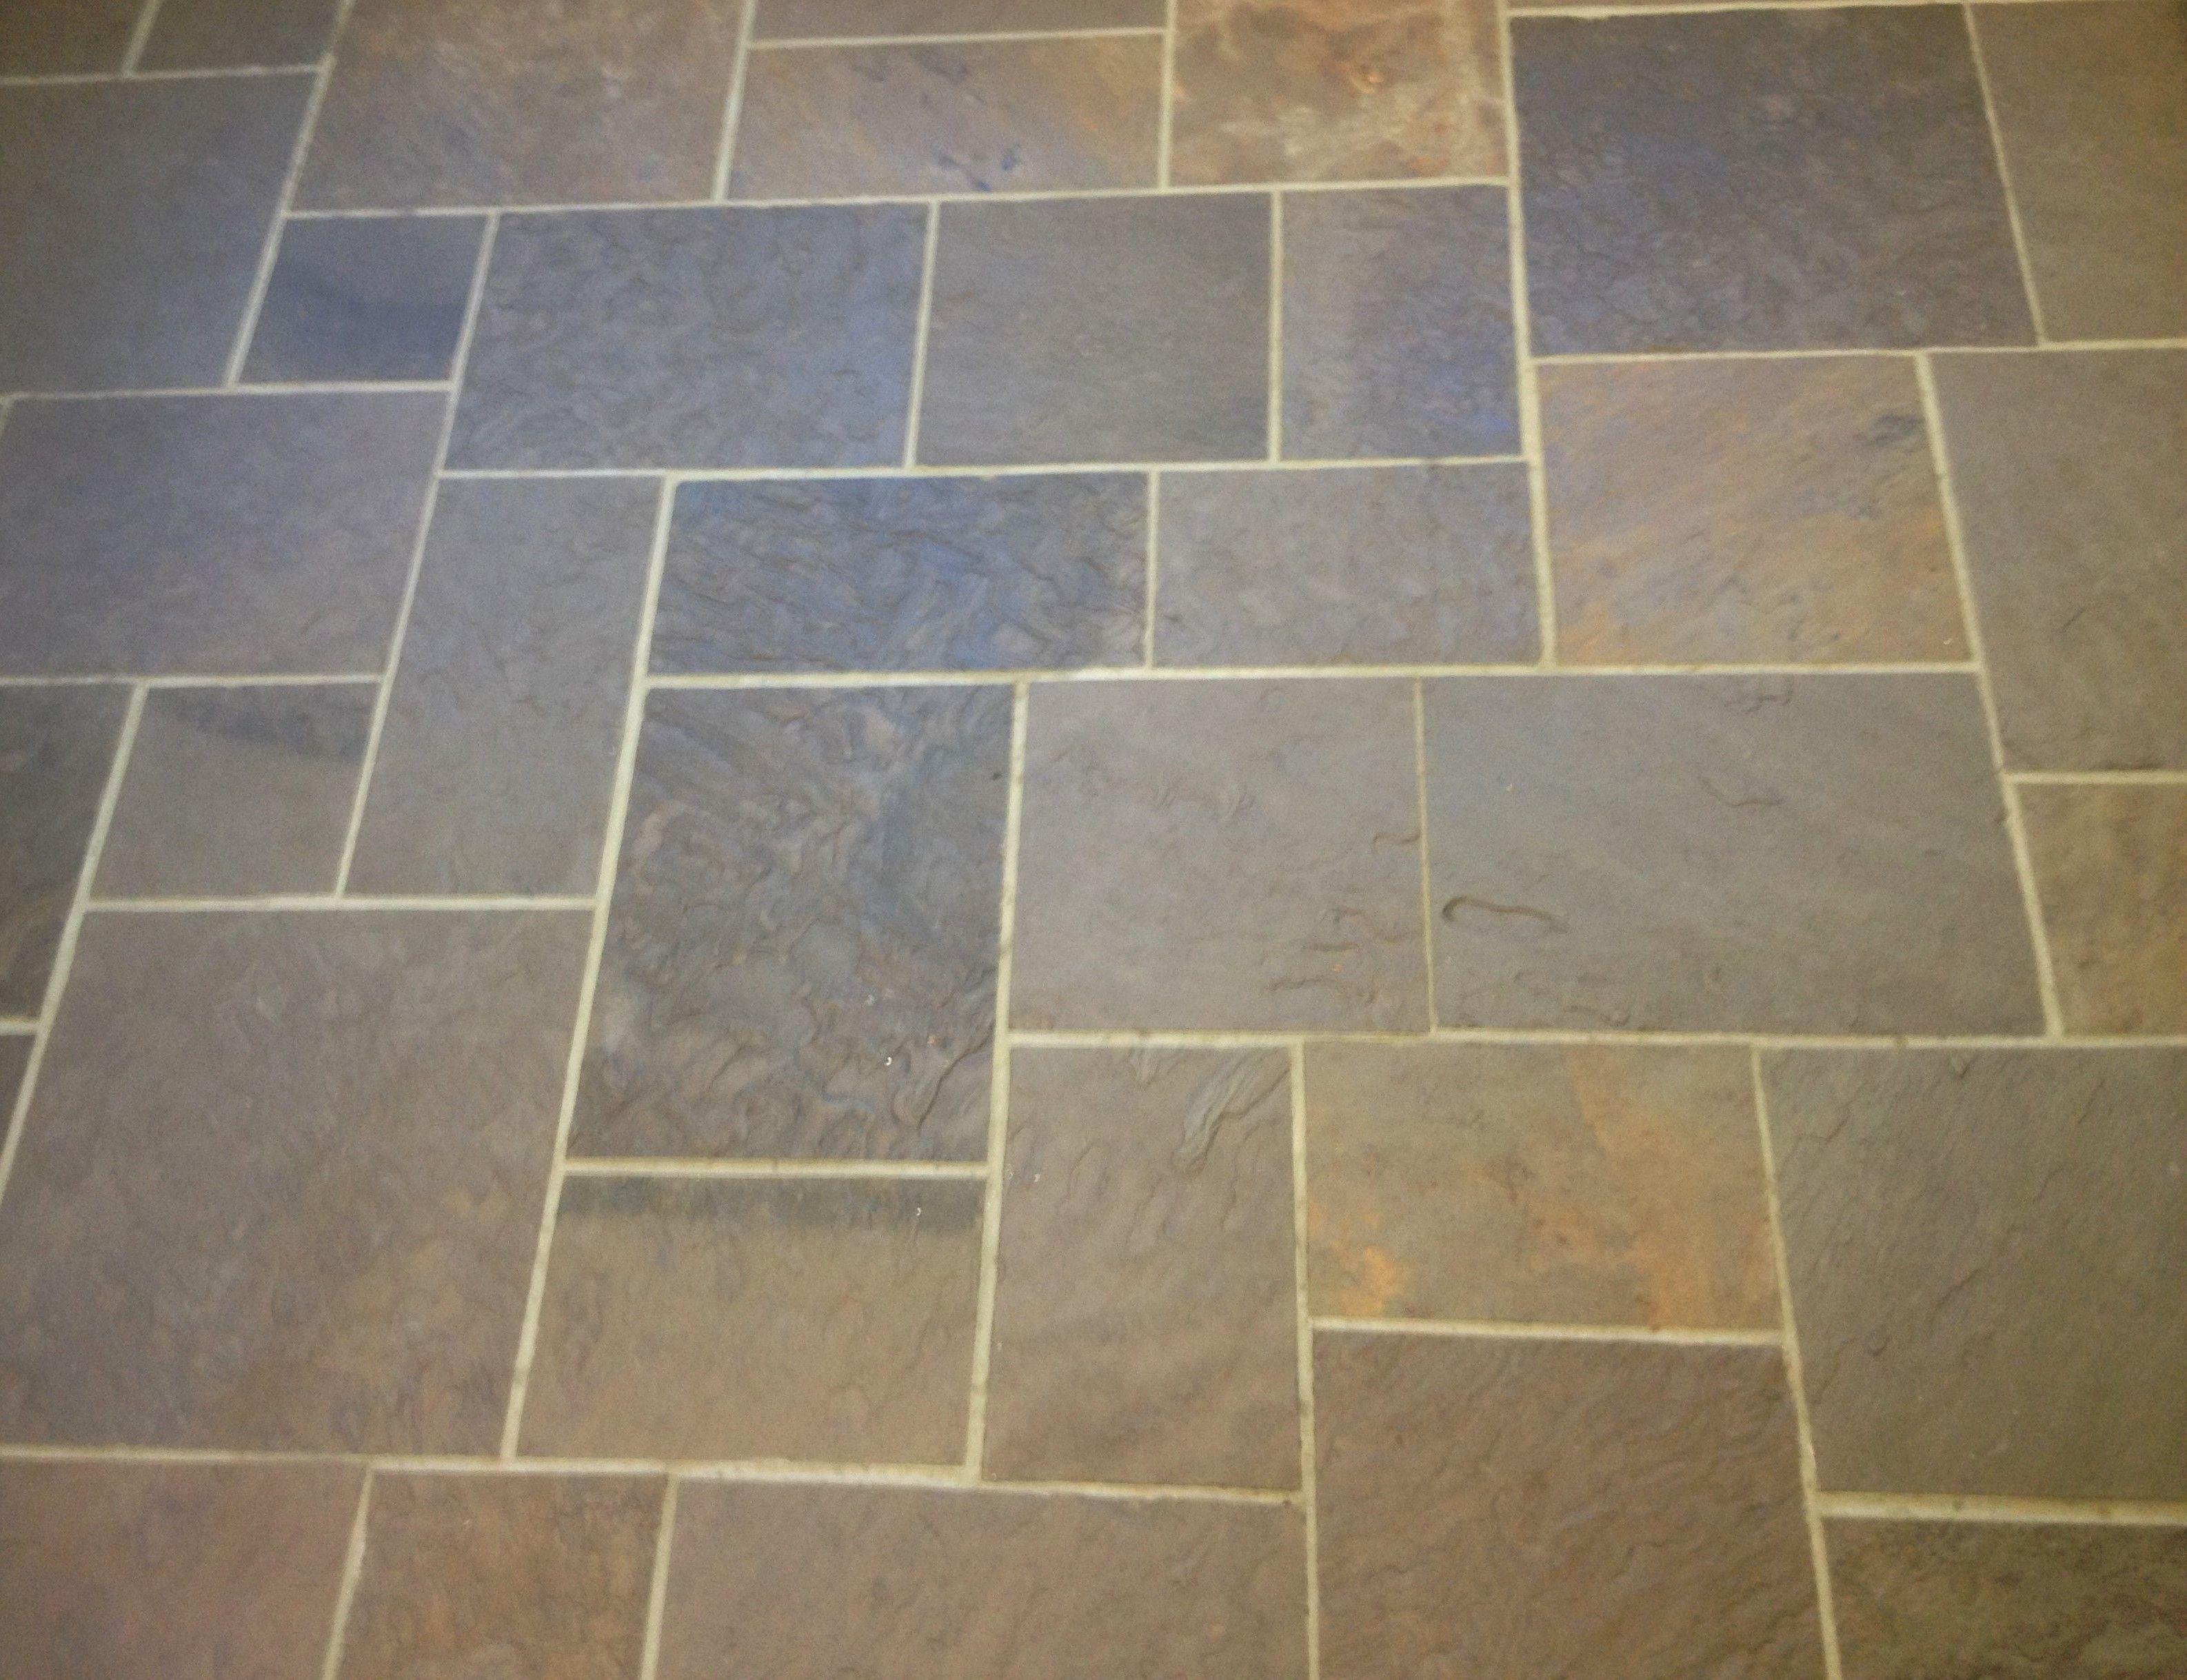 Lilac pattern bluestone floor lilac pattern bluestone floor detail dailygadgetfo Gallery